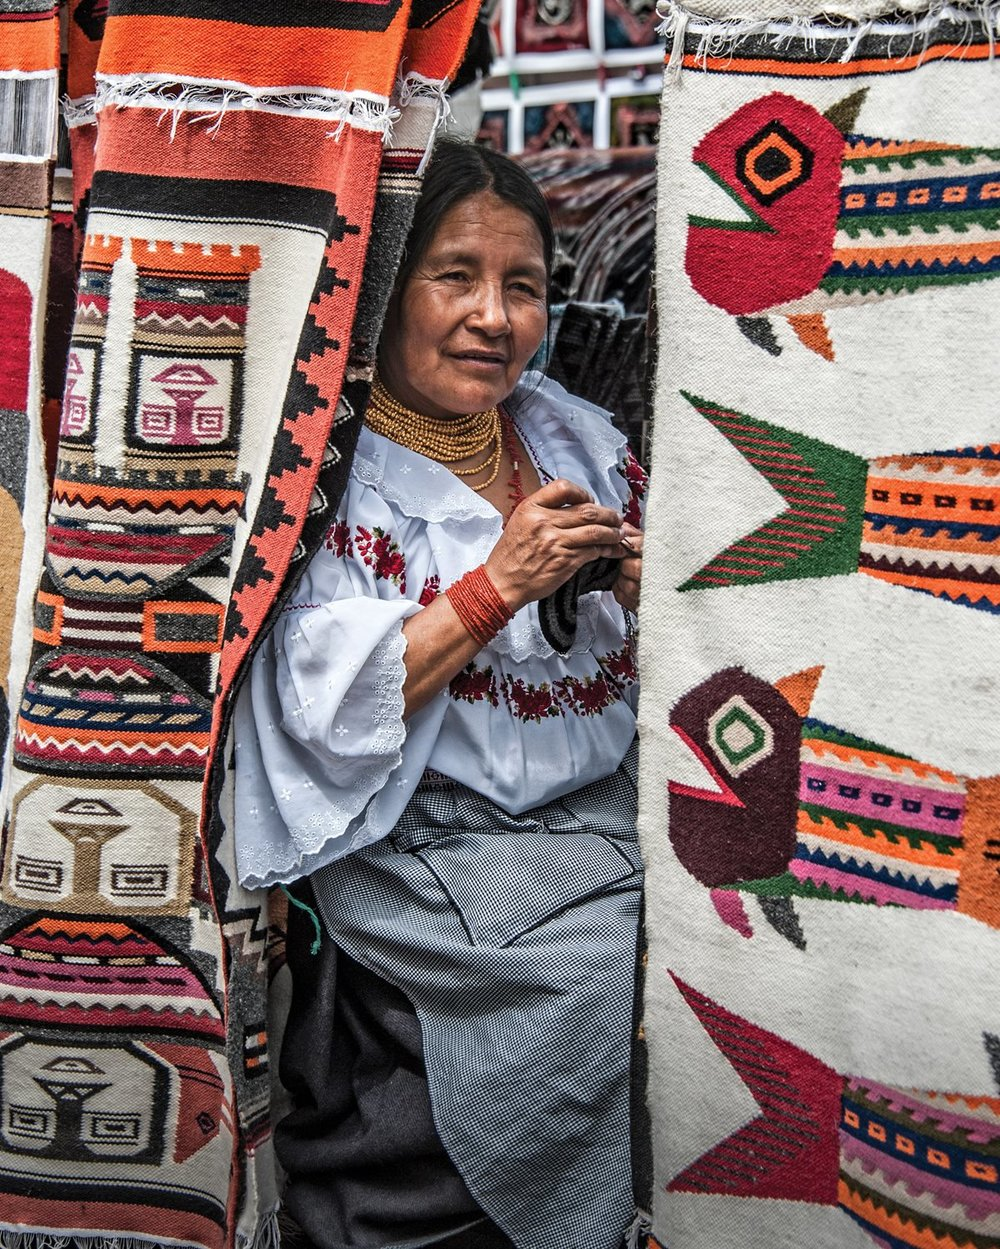 Andean artistry at the Otavalo Market.Photo by KSENIYA RAGOZINA/GETTY IMAGES,